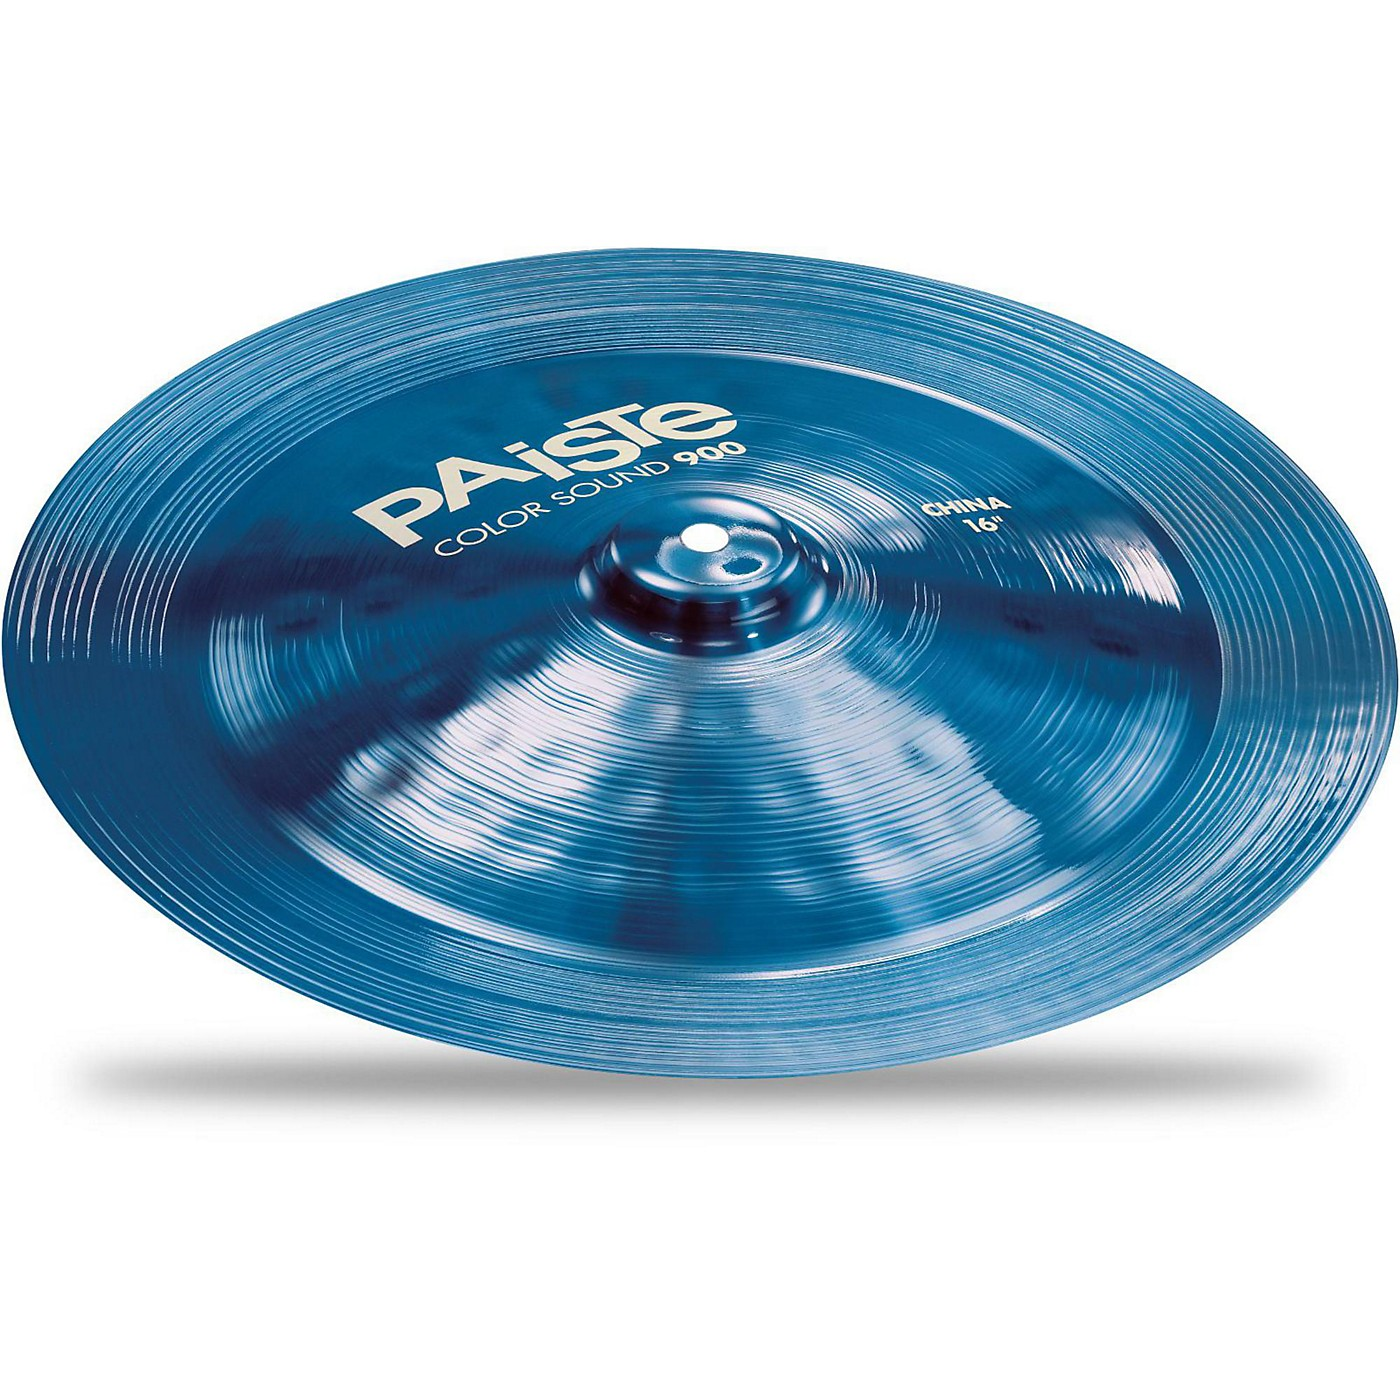 Paiste Colorsound 900 China Cymbal Blue thumbnail